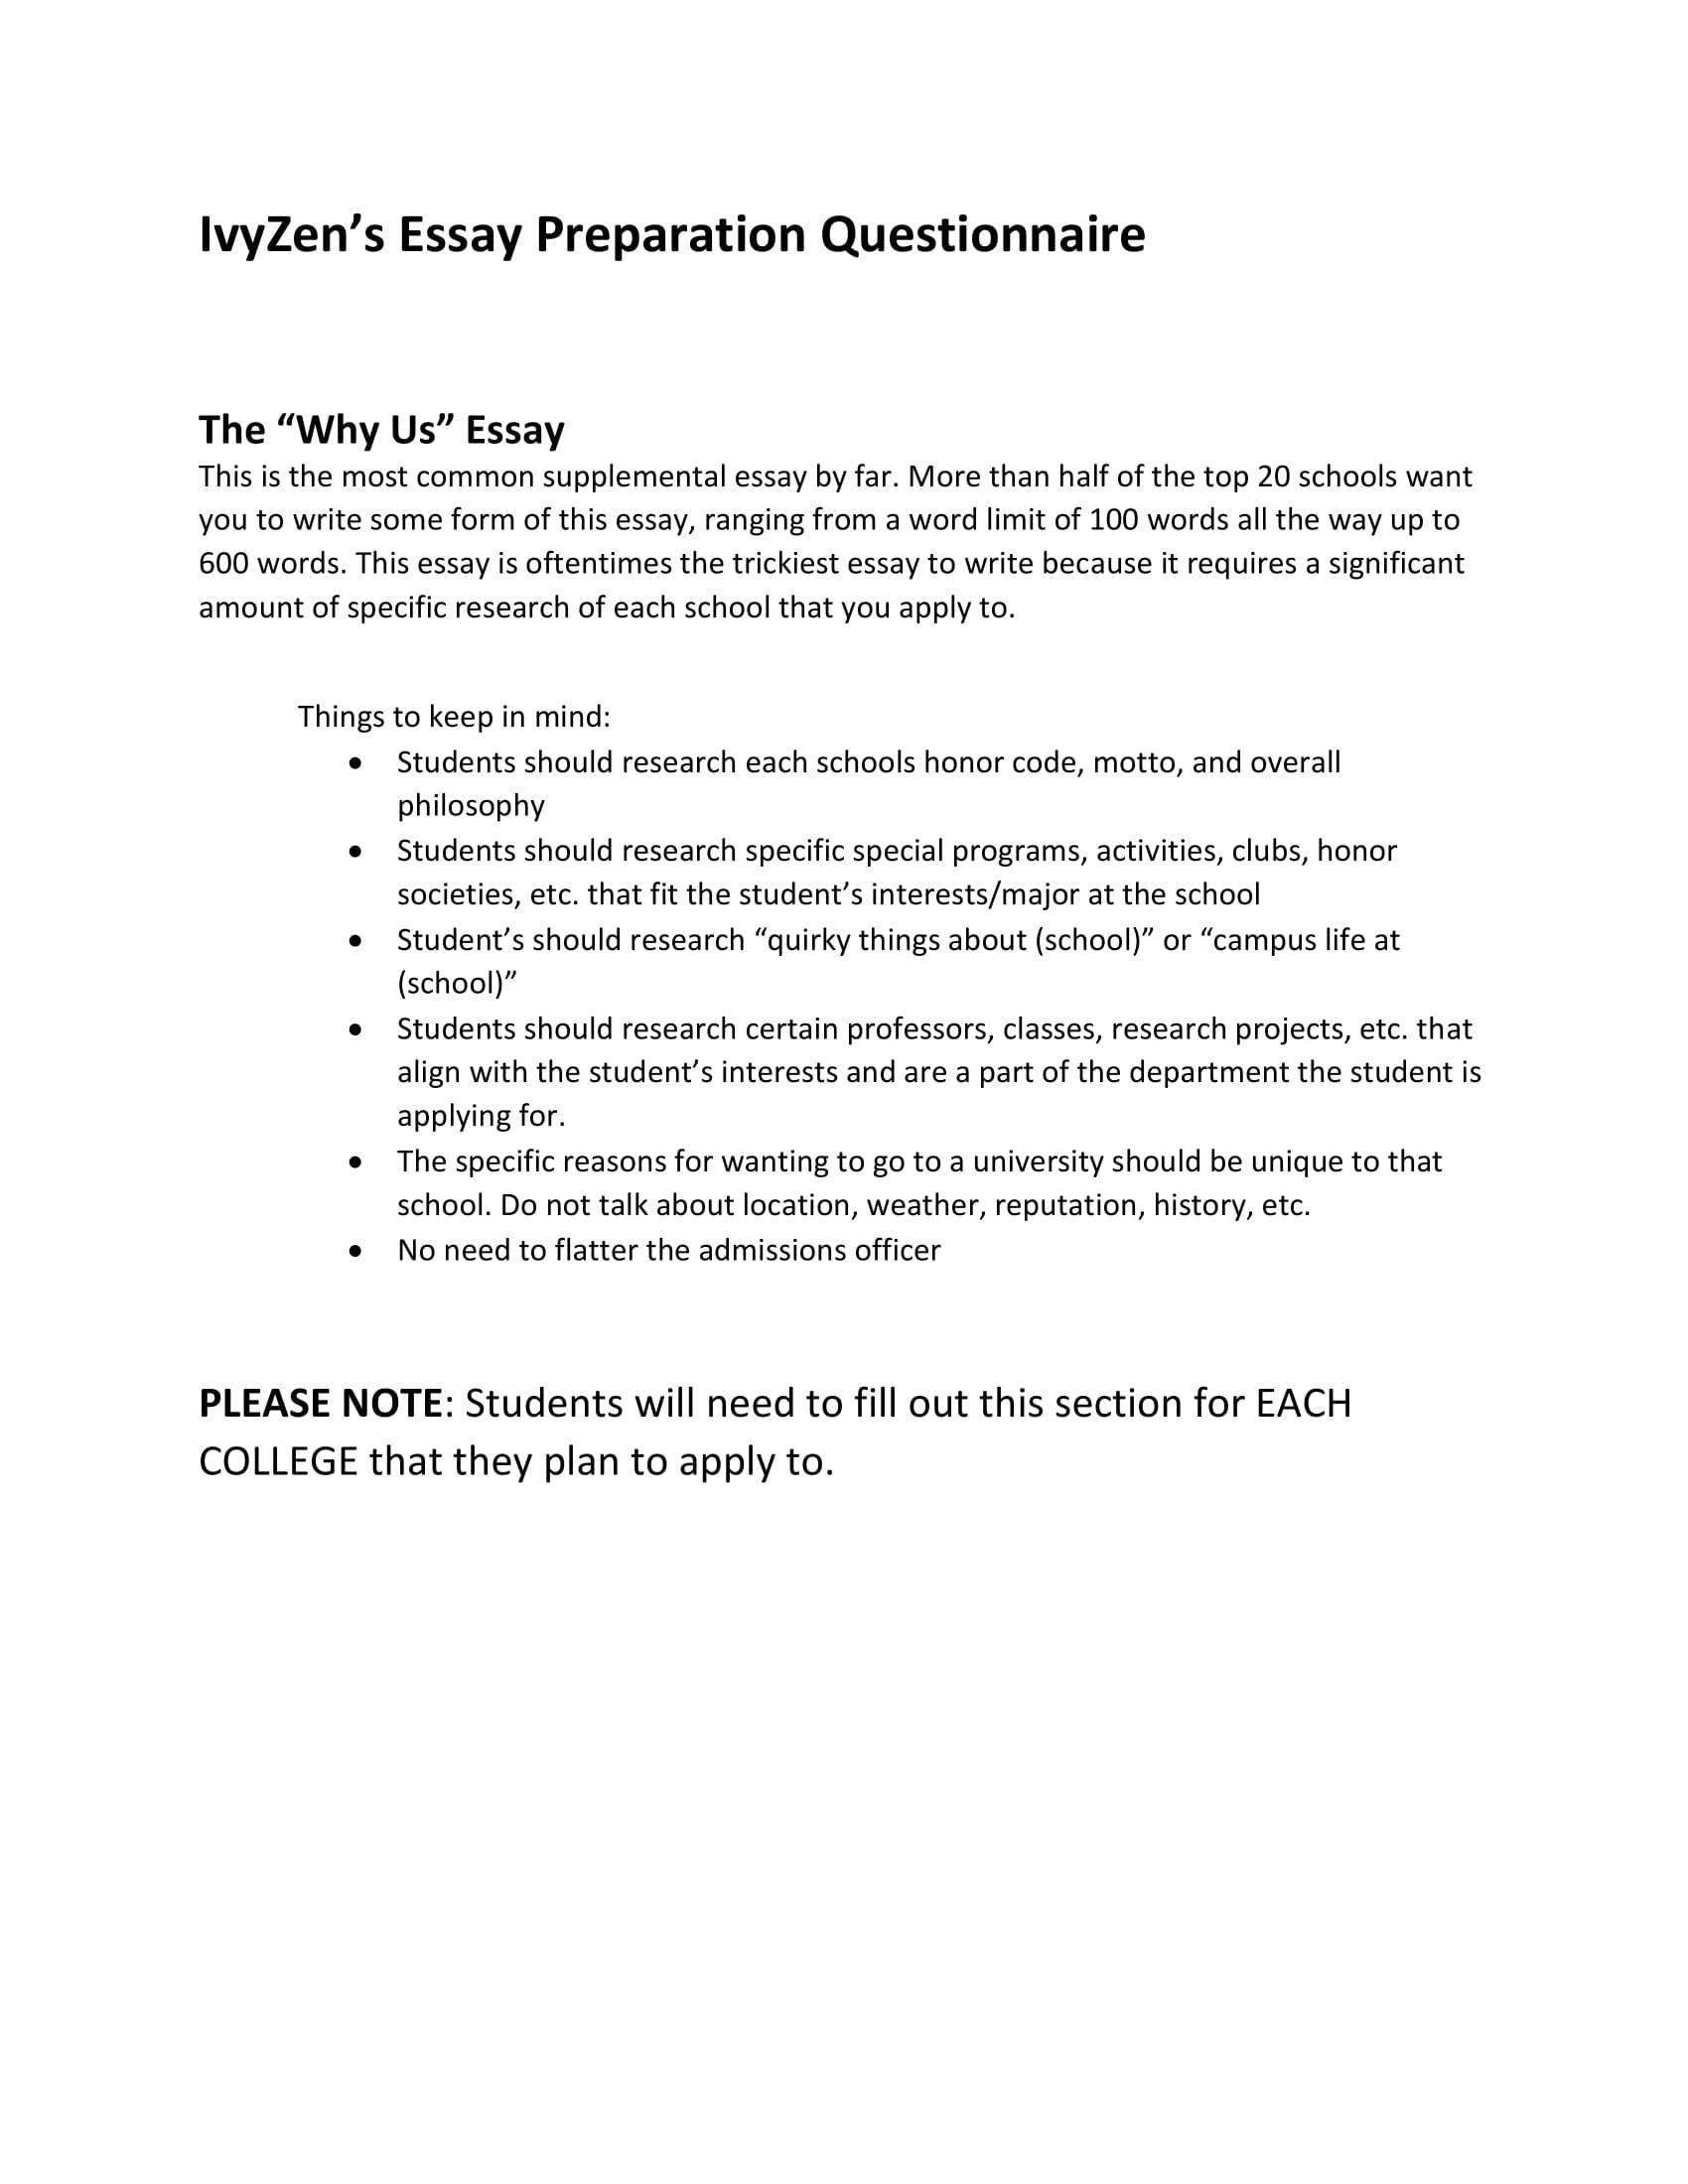 010 Module 1fit17002c2200ssl1 Essay Example College Surprising Organizer Application Graphic Organizers Argumentative Full